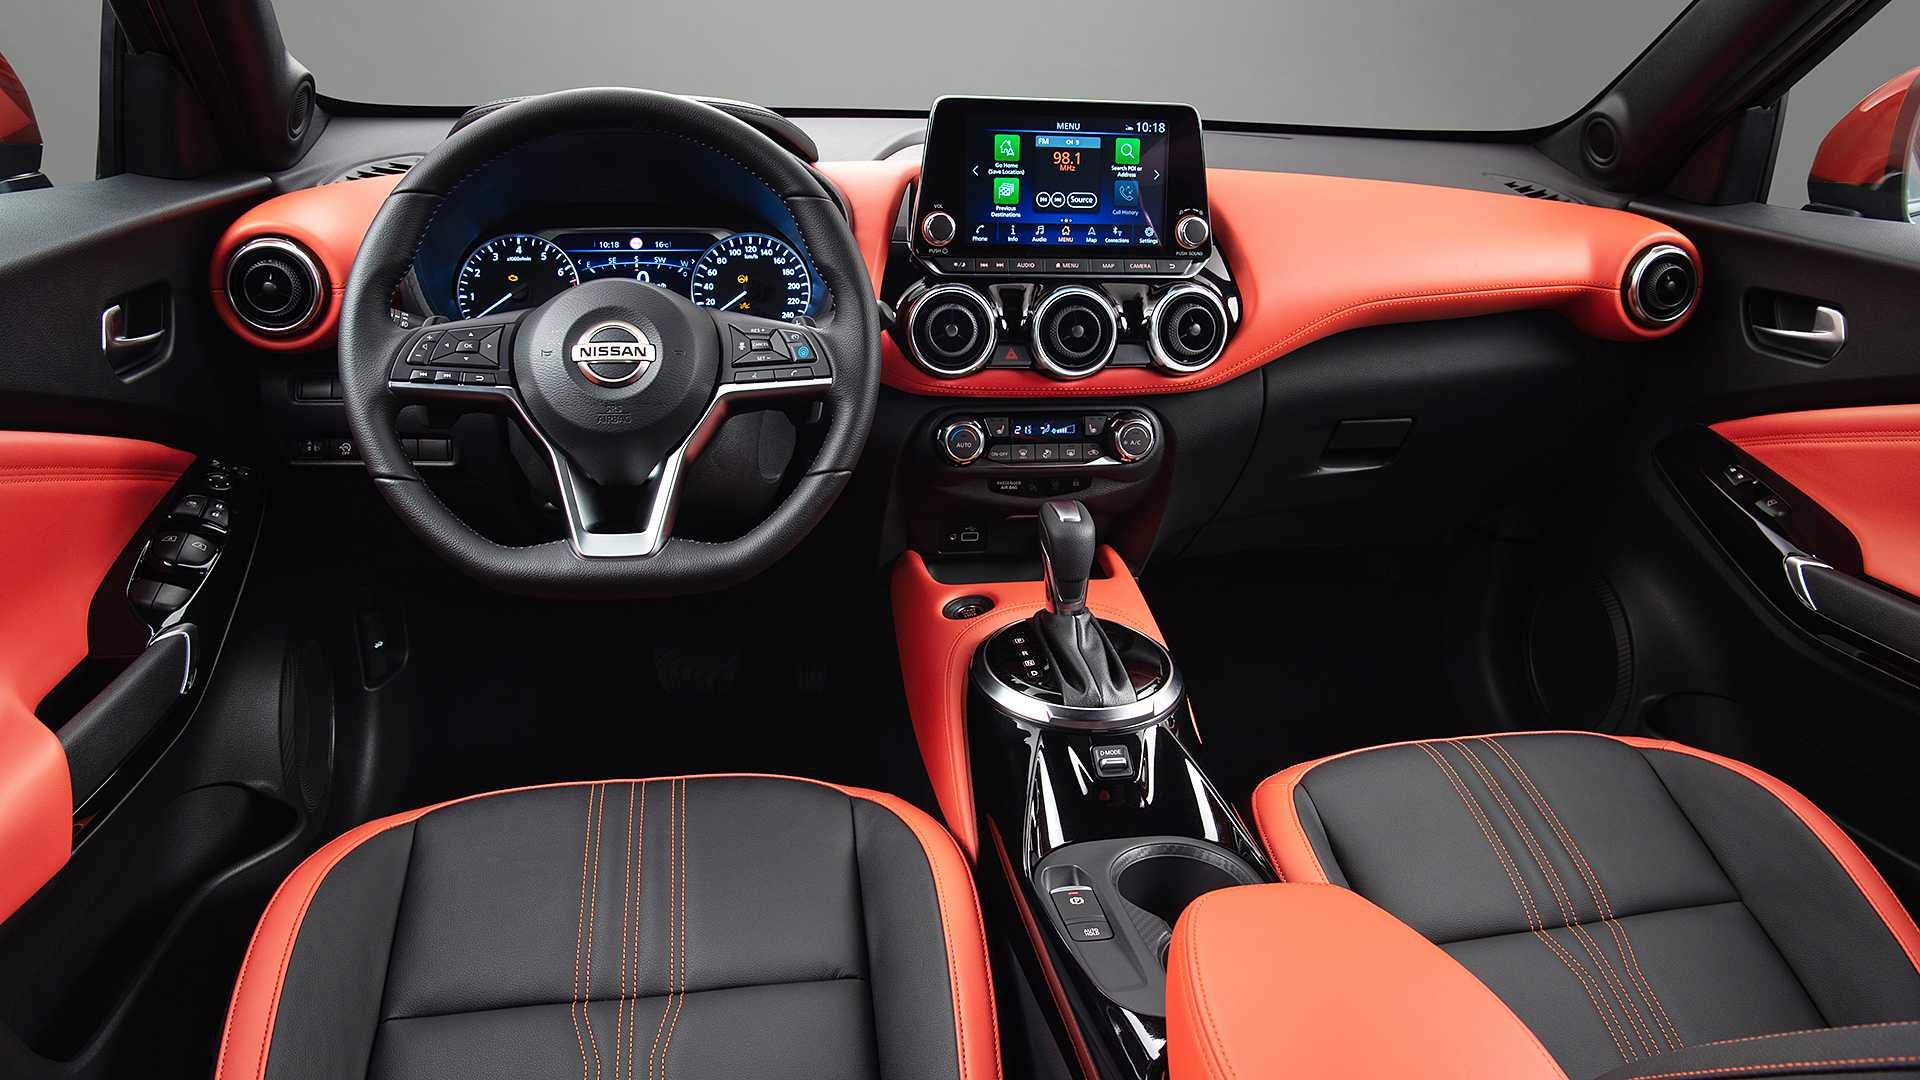 Nissan Juke- A Trend Setter 4